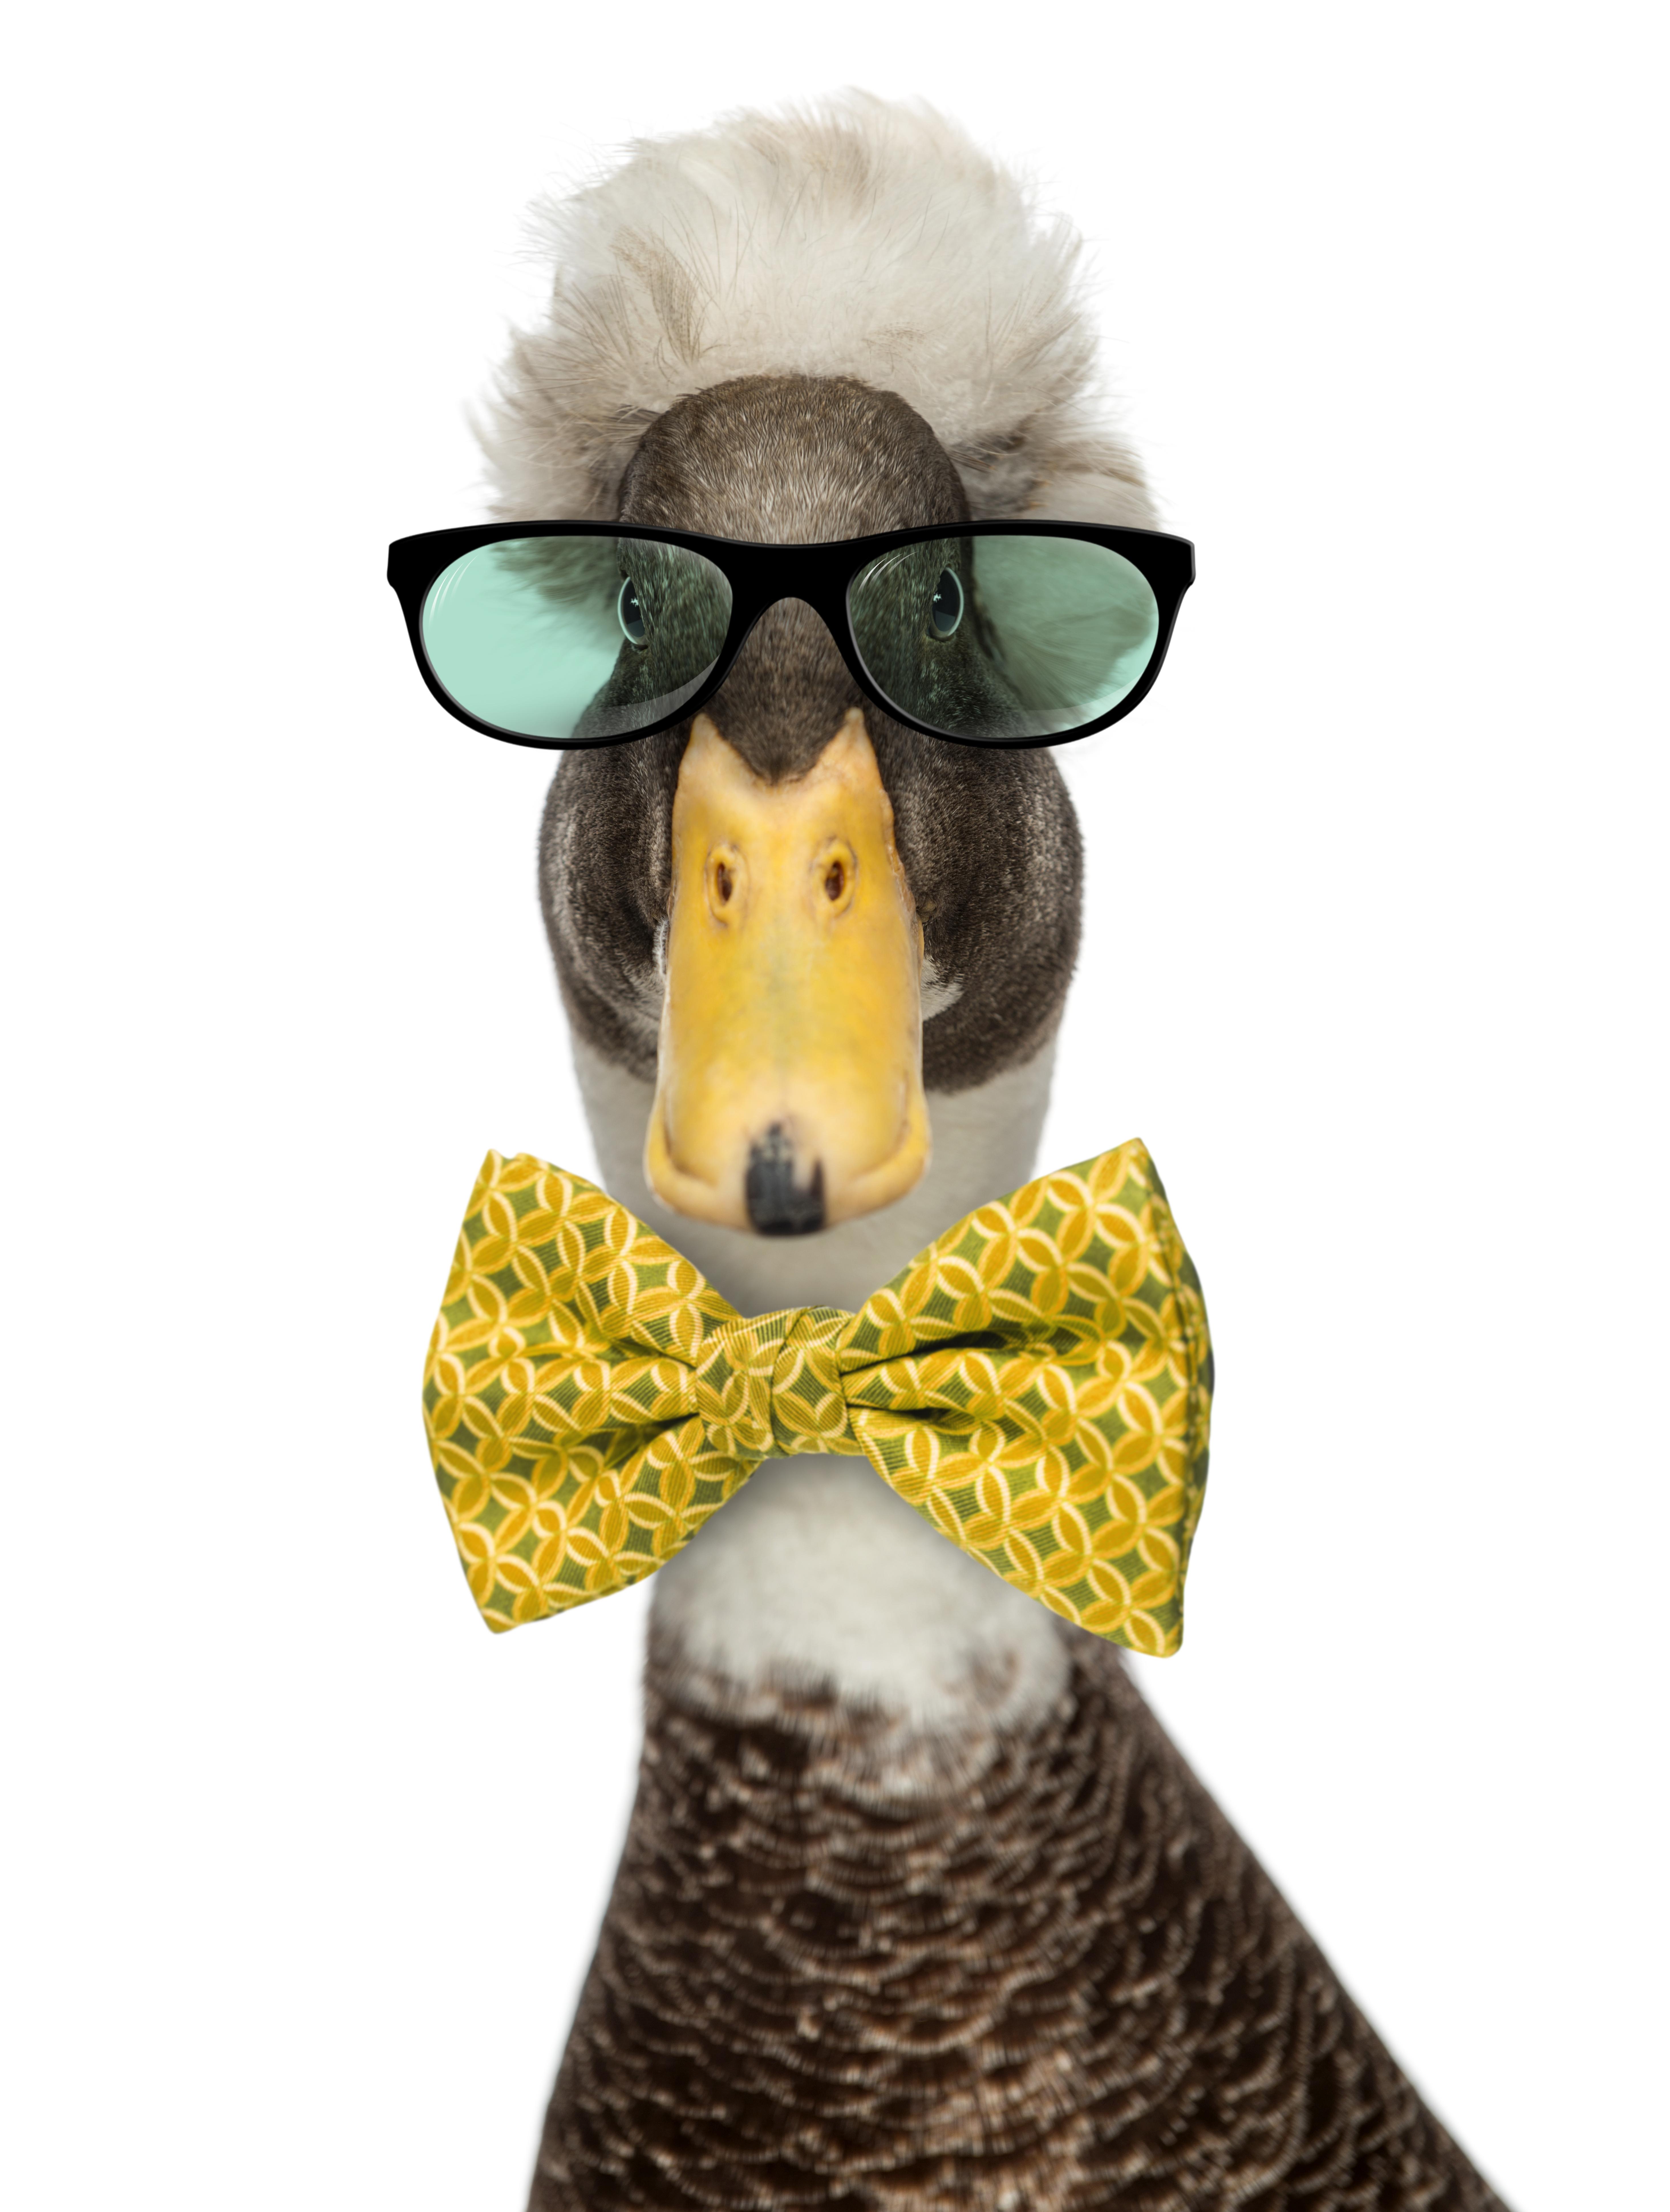 Line your ducks up